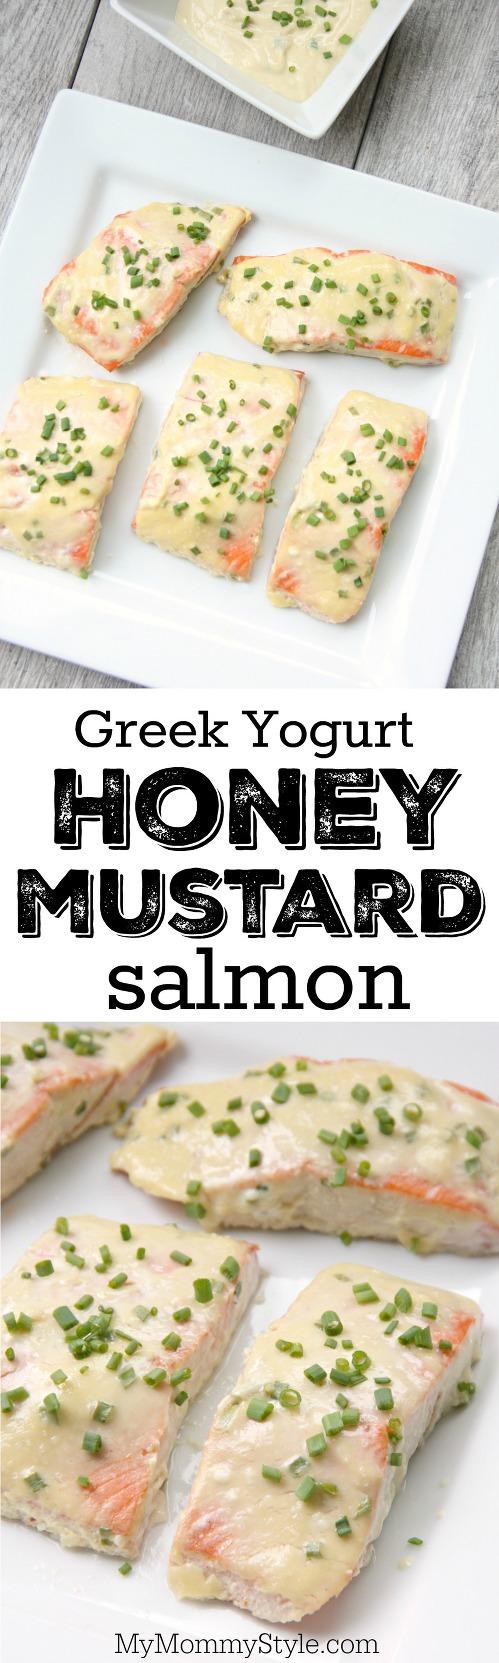 Greek yogurt honey mustard salmon - My Mommy Style